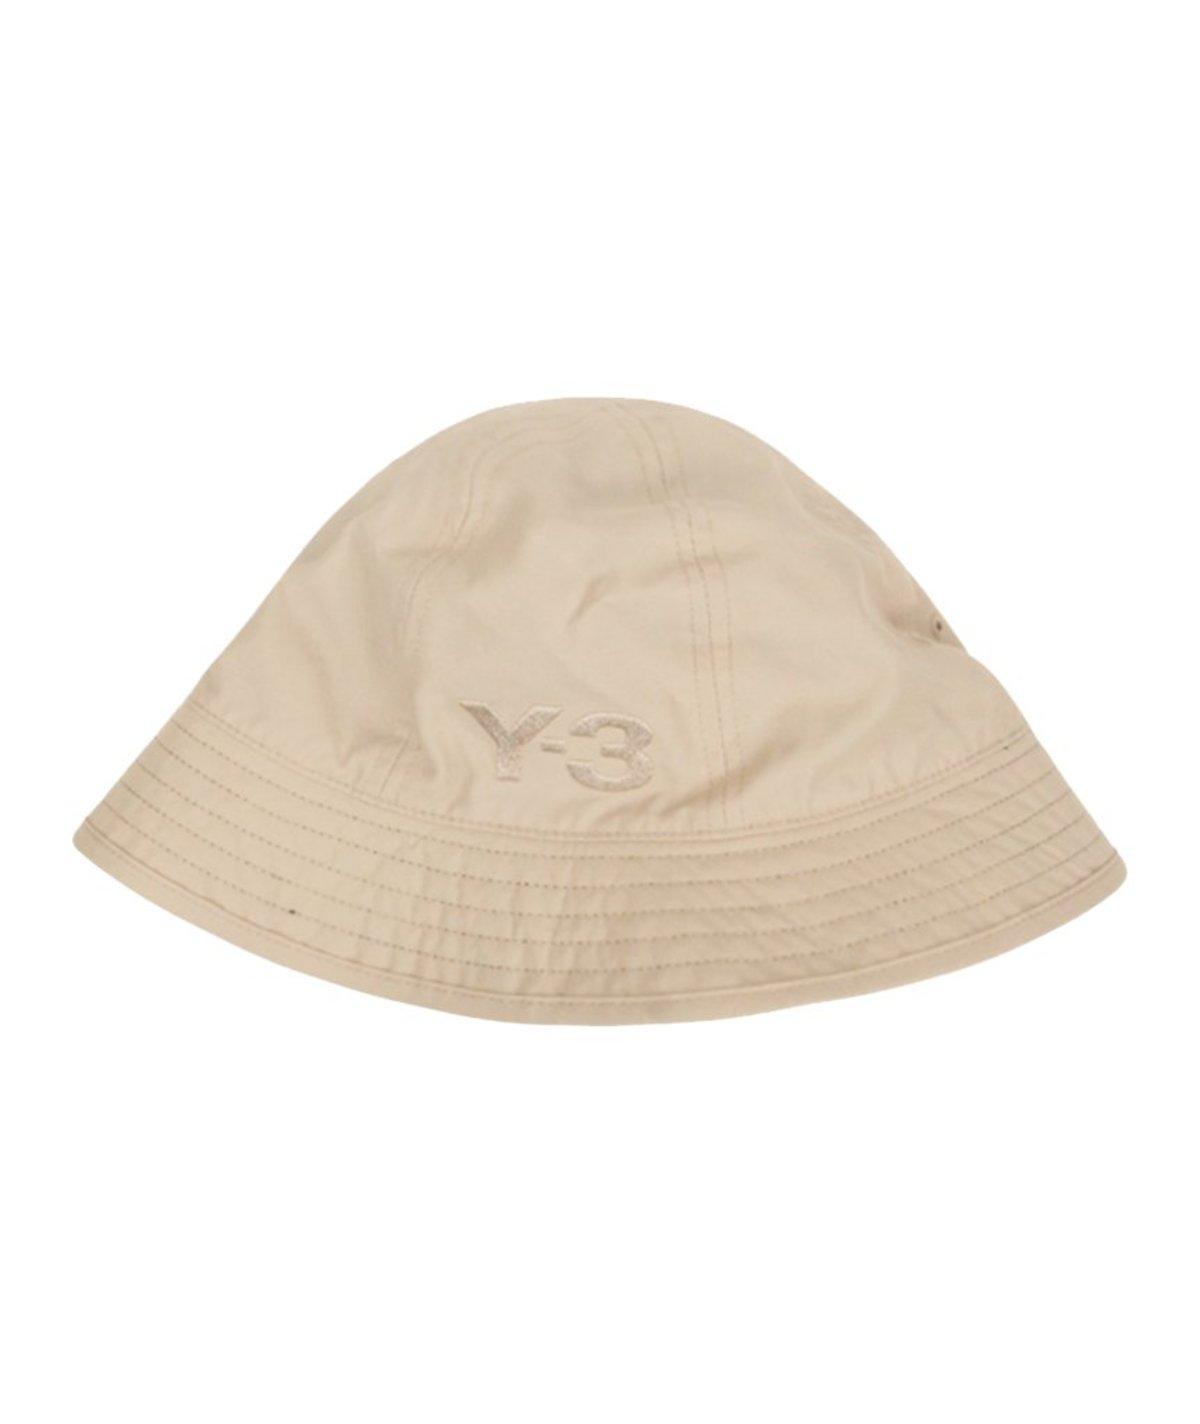 Adidas Y 3 Reversible Bucket Hat Khaki Garmentory